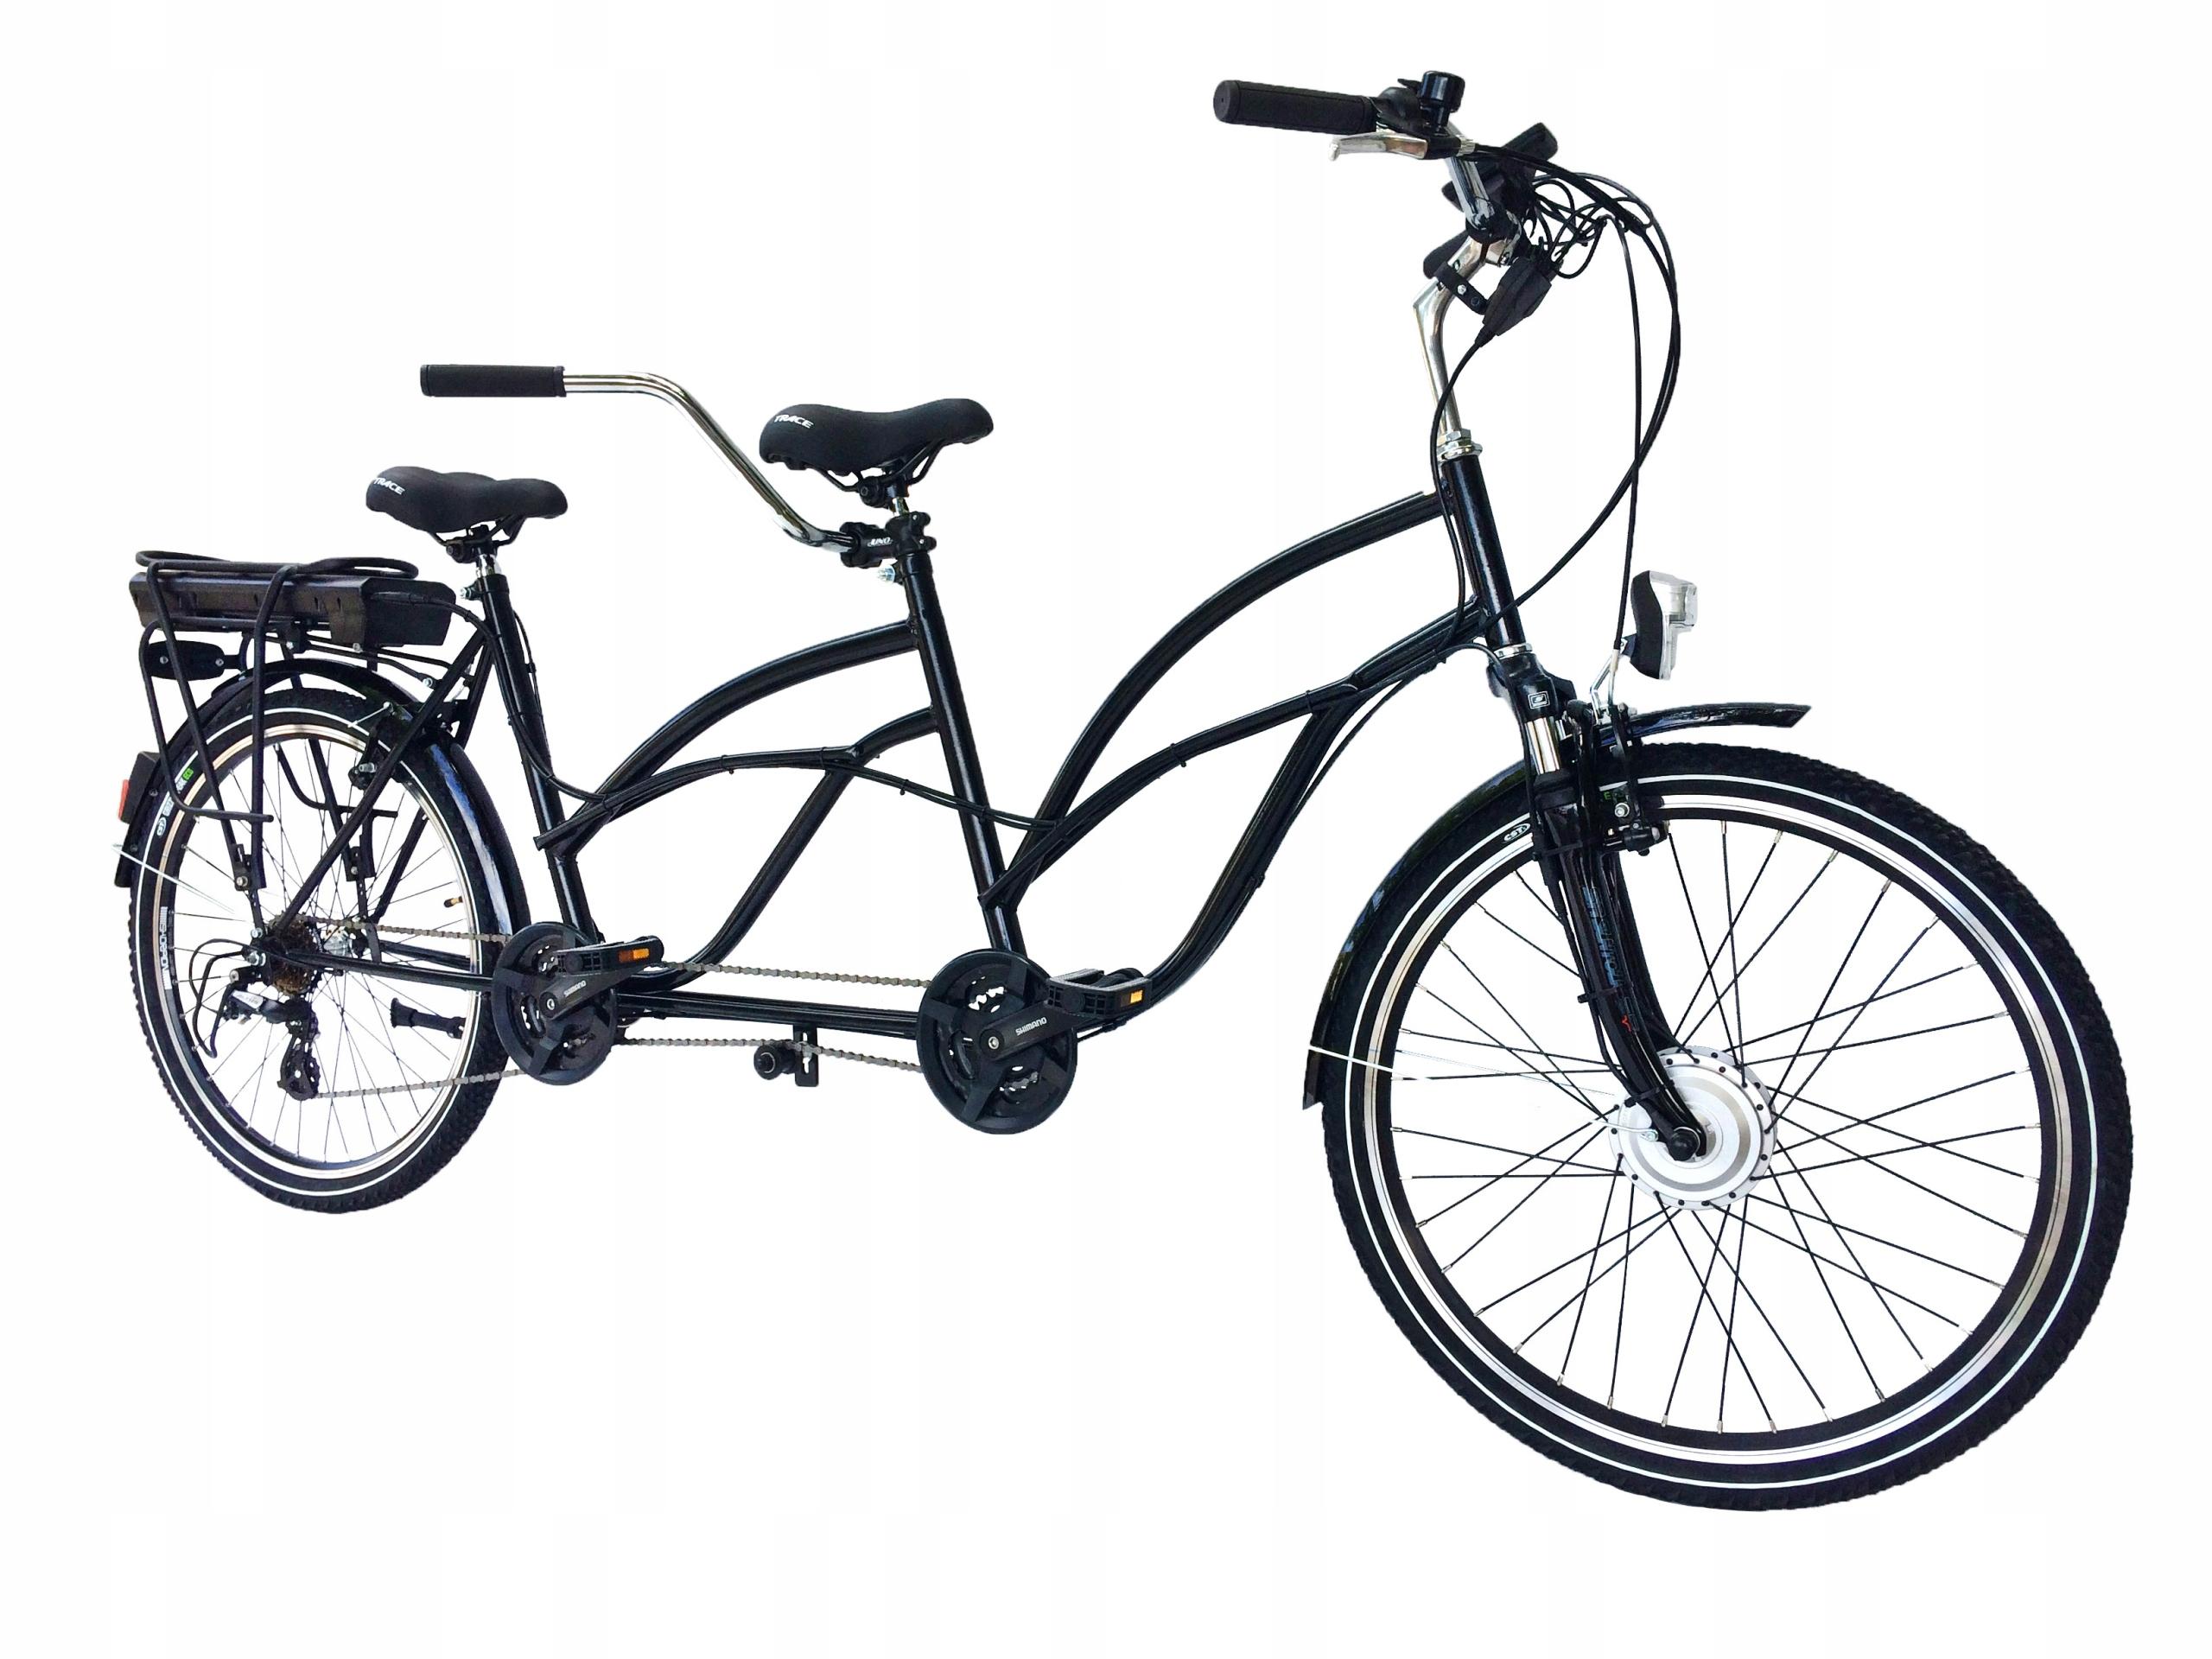 велосипед тандем салют фото все